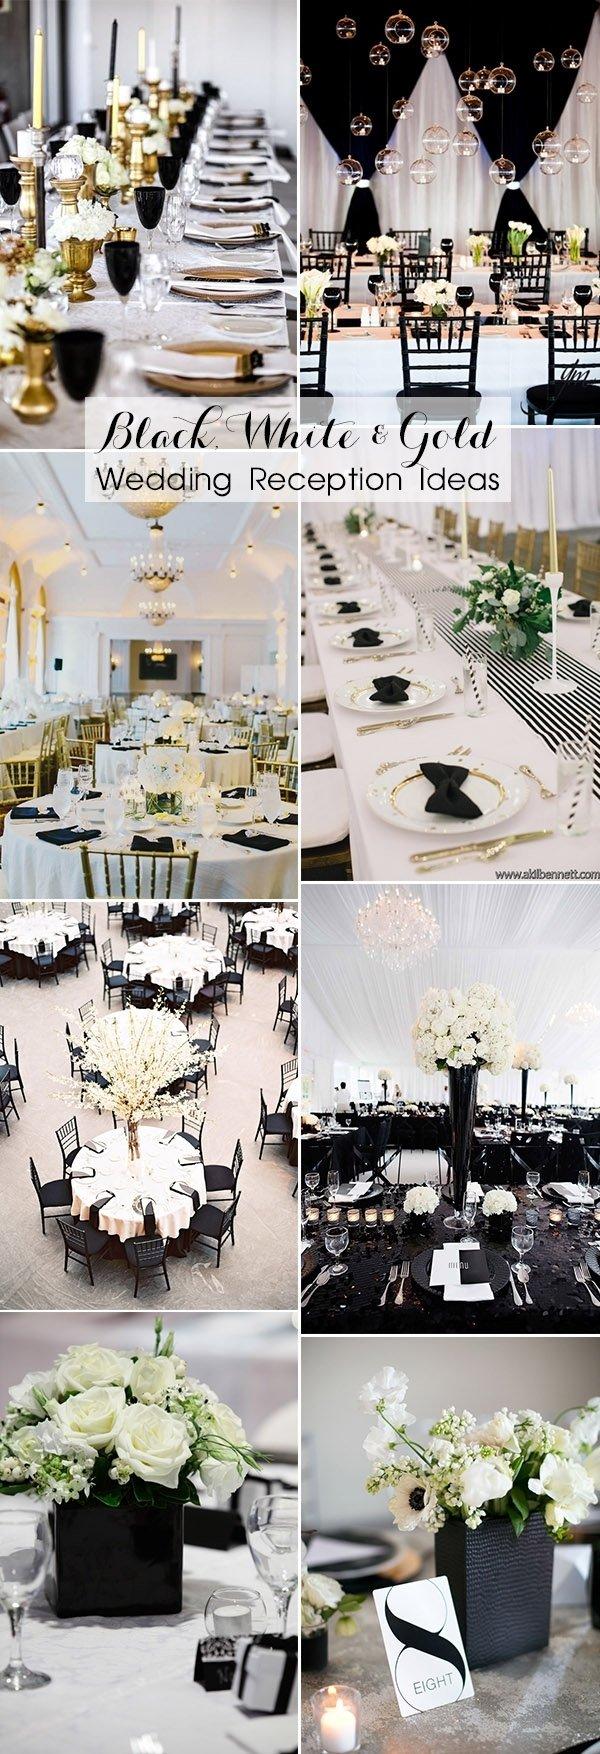 10 Amazing Black And White Wedding Ideas 40 most inspiring classic black and white wedding ideas 2021